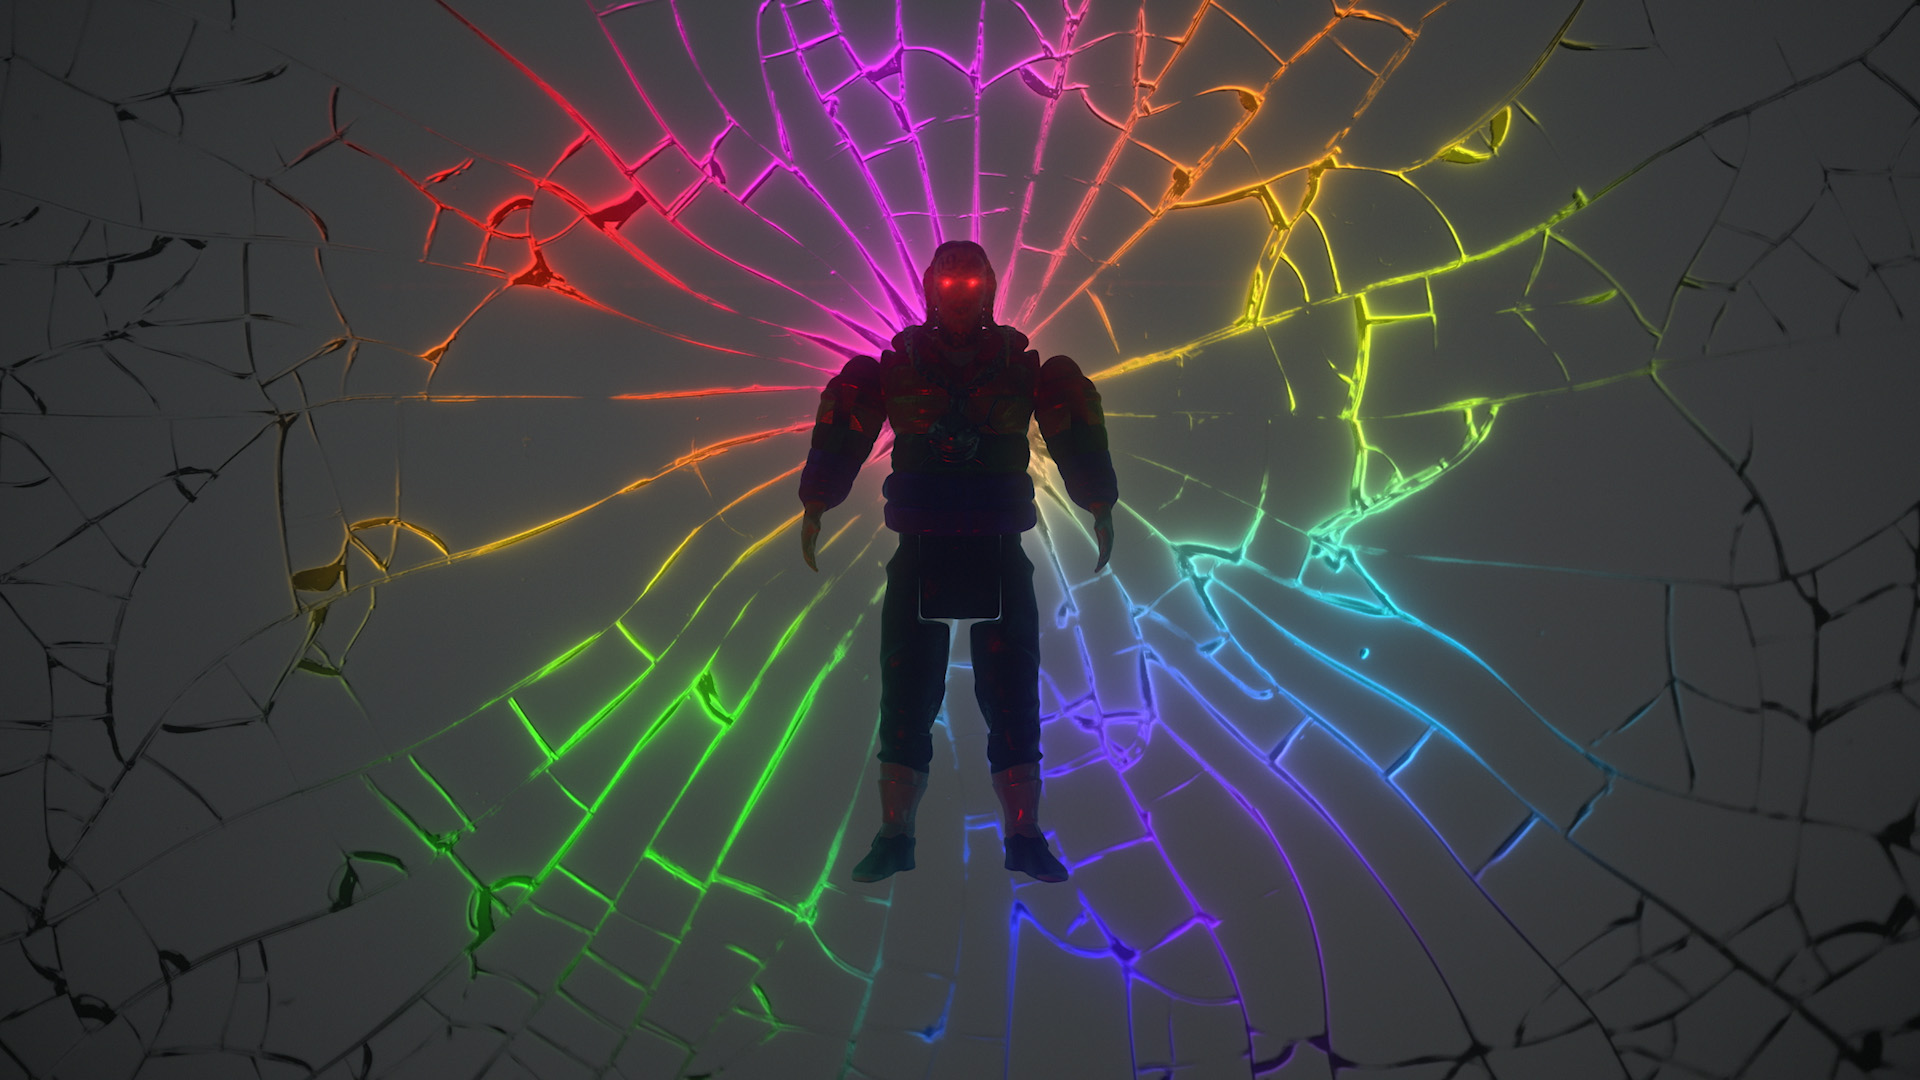 Supervillain_3.3_FINAL_PRORESHQ_HD-87968